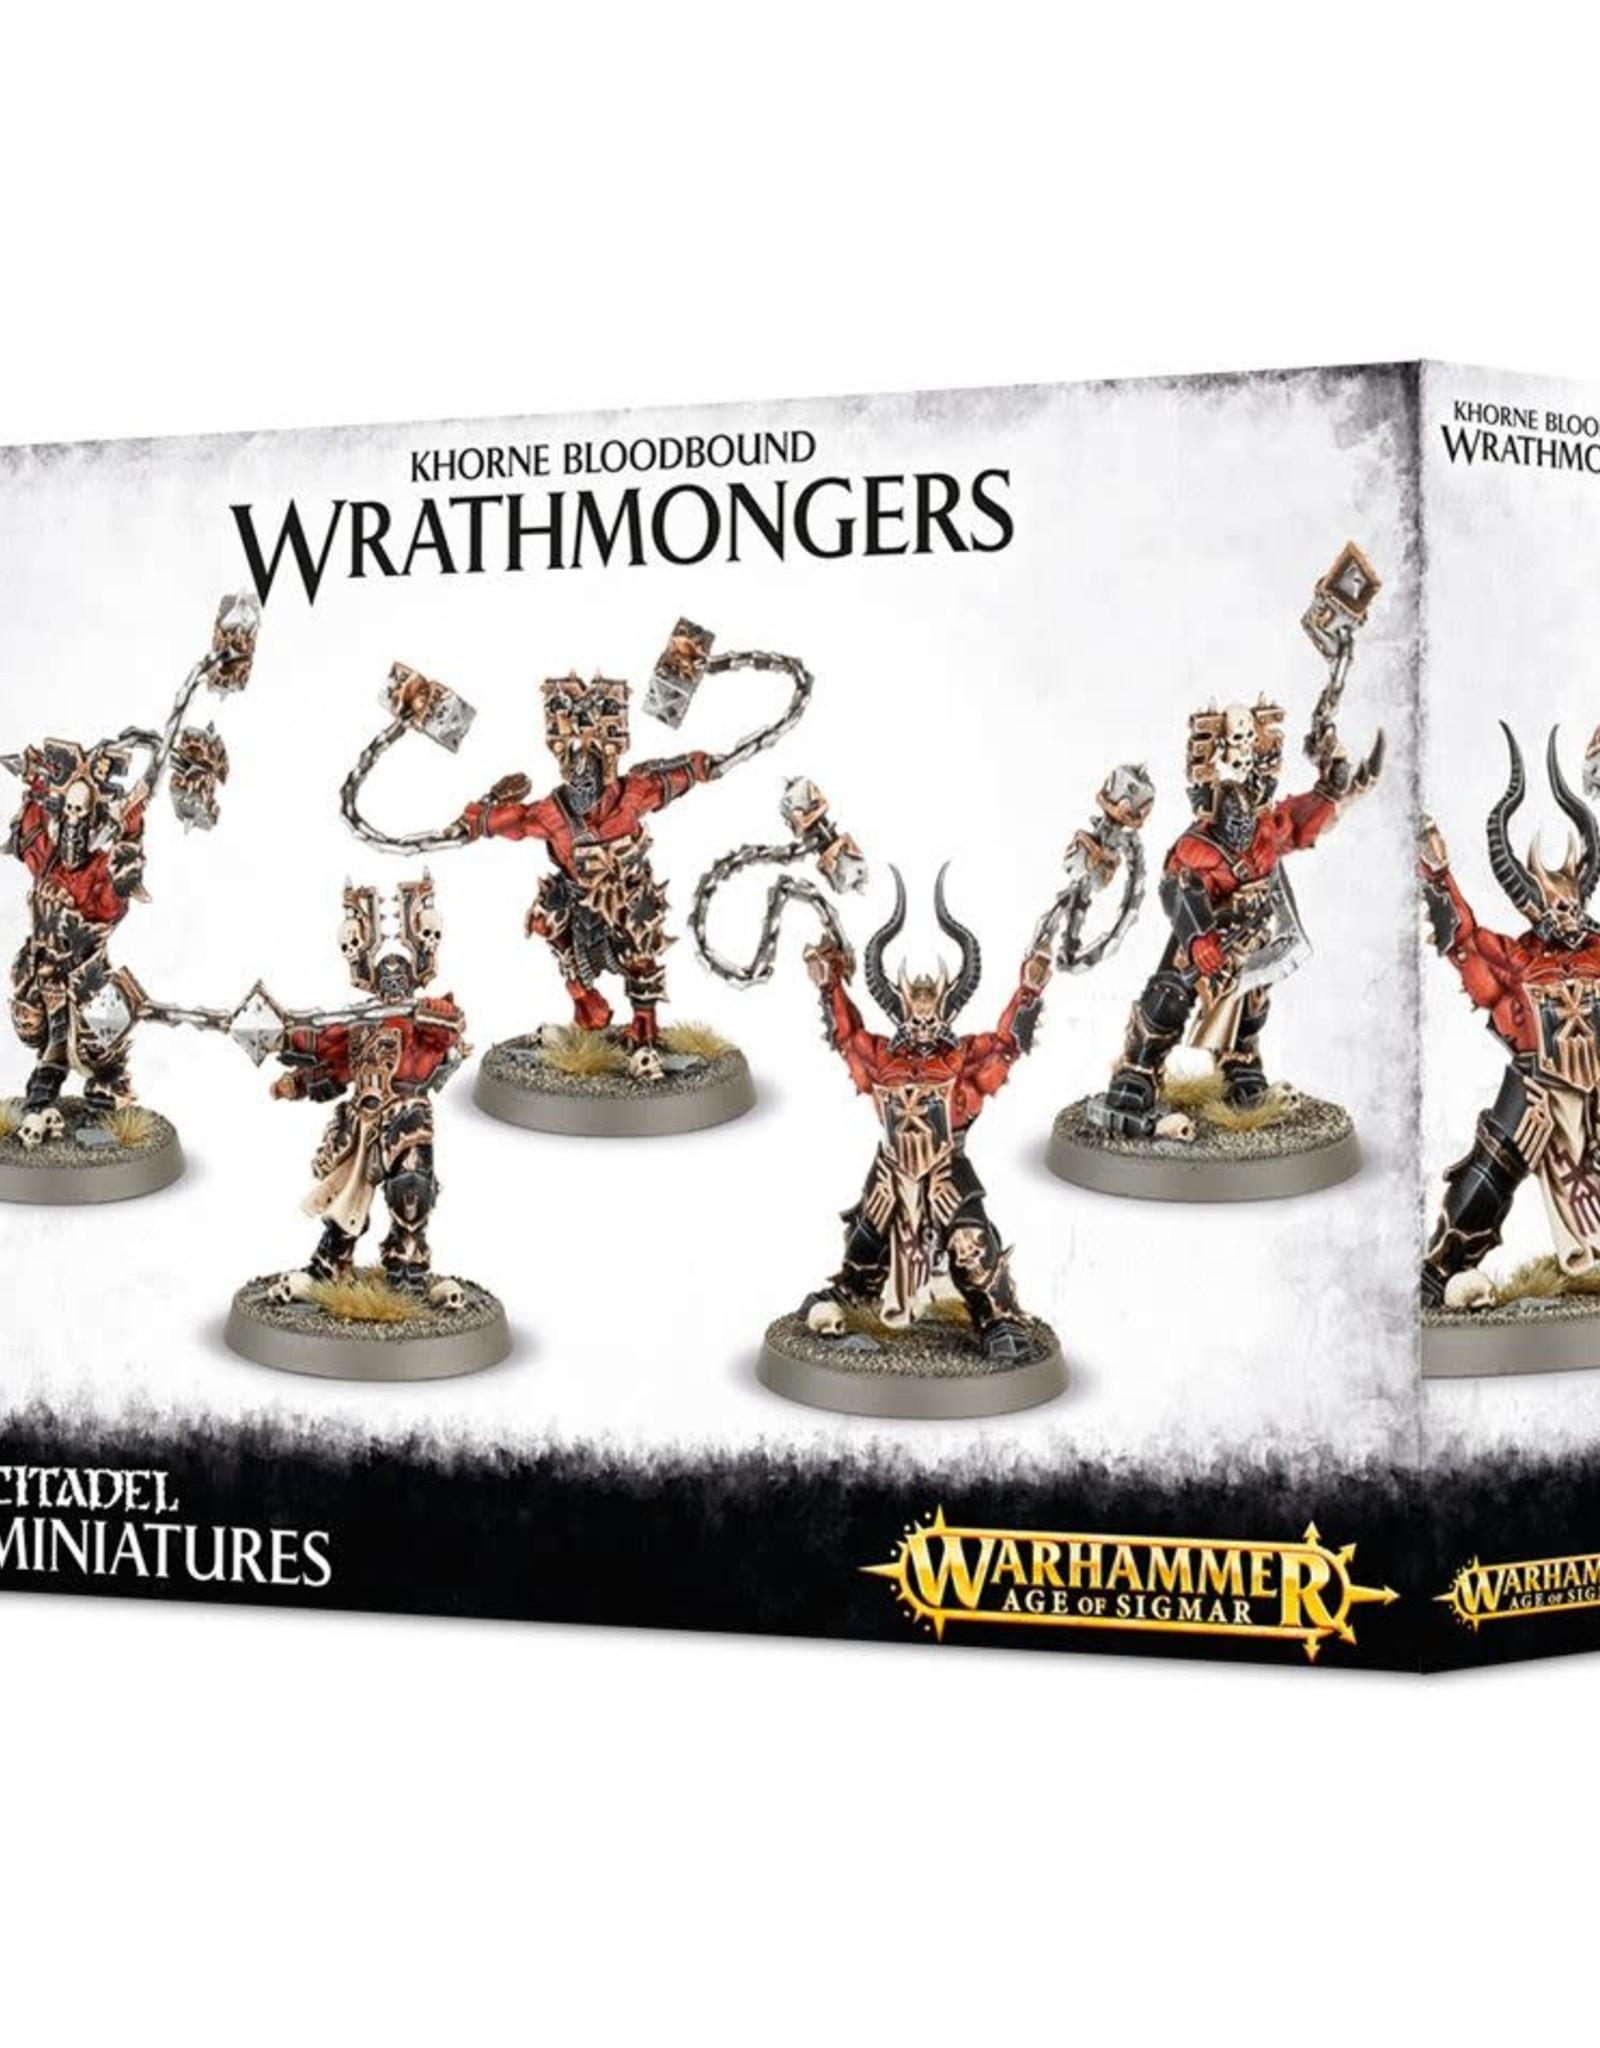 Age of Sigmar Khorne Bloodbound Wrathmongers